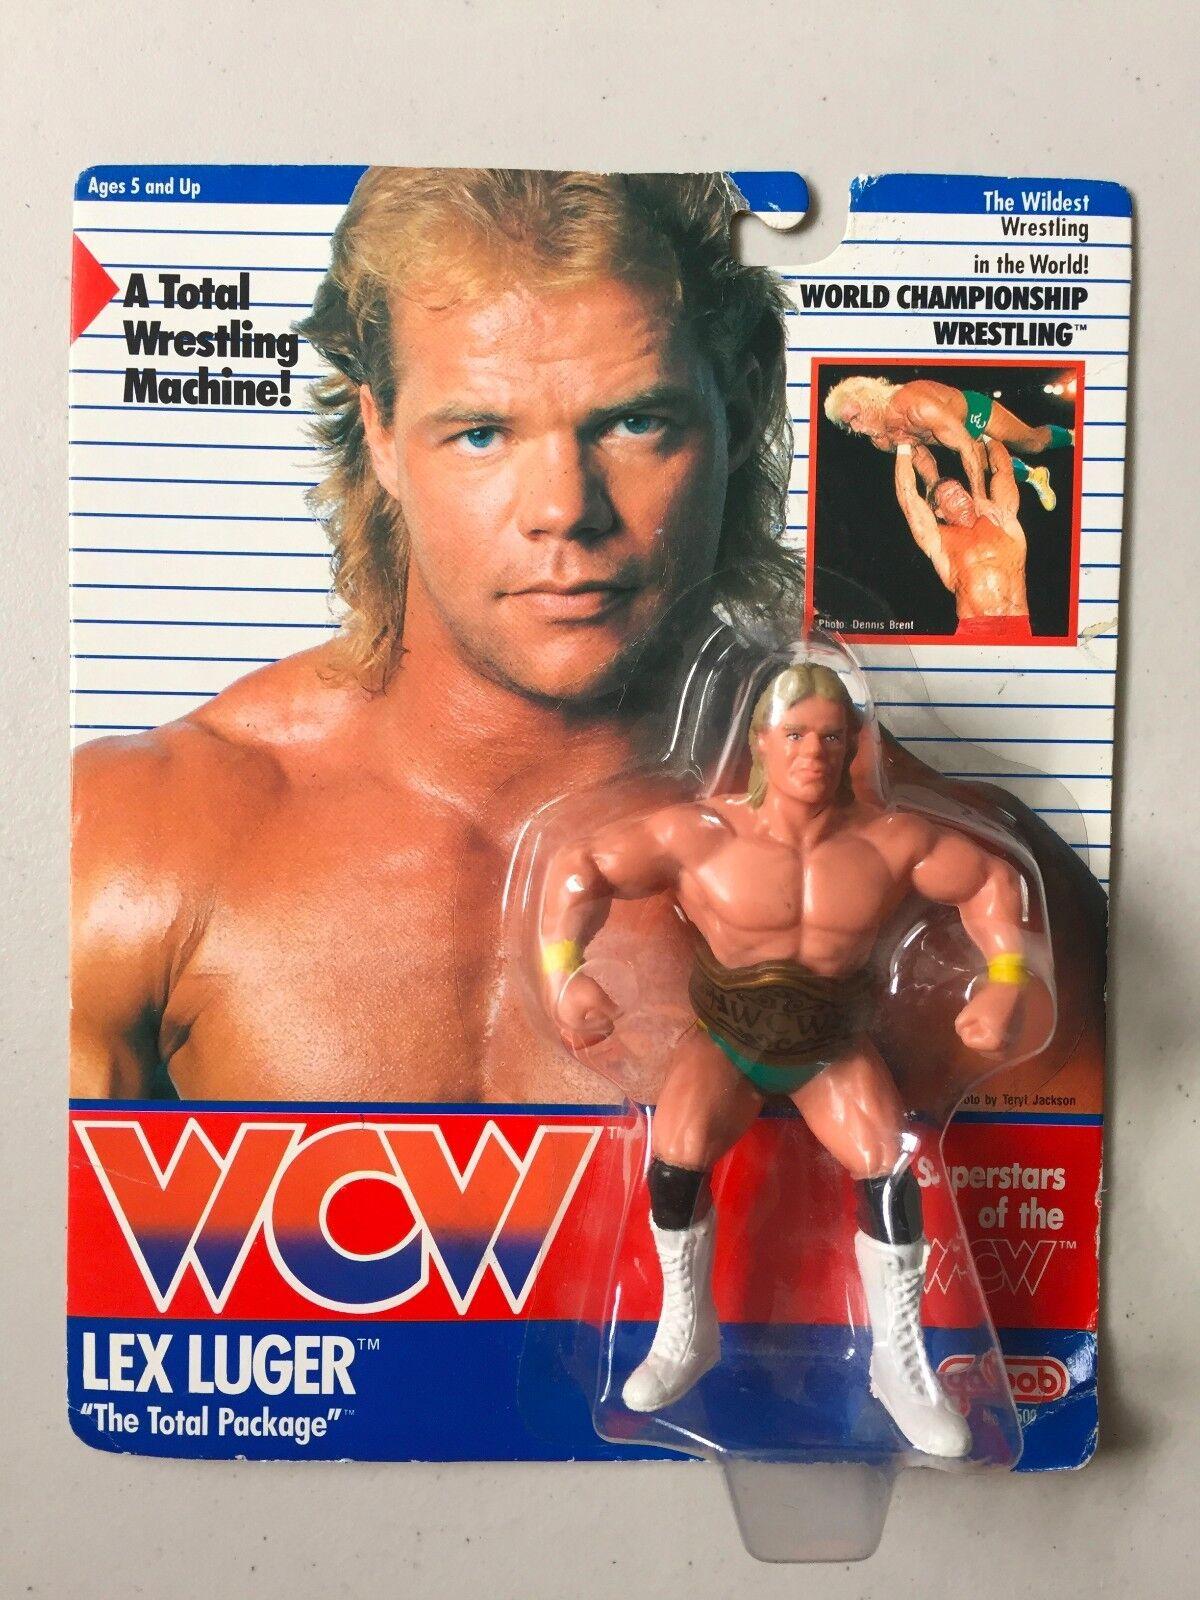 WCW GALOOB UK esclusivo Lex Luger Wrestling cifra MOC WWF WWE NWA RARE verde